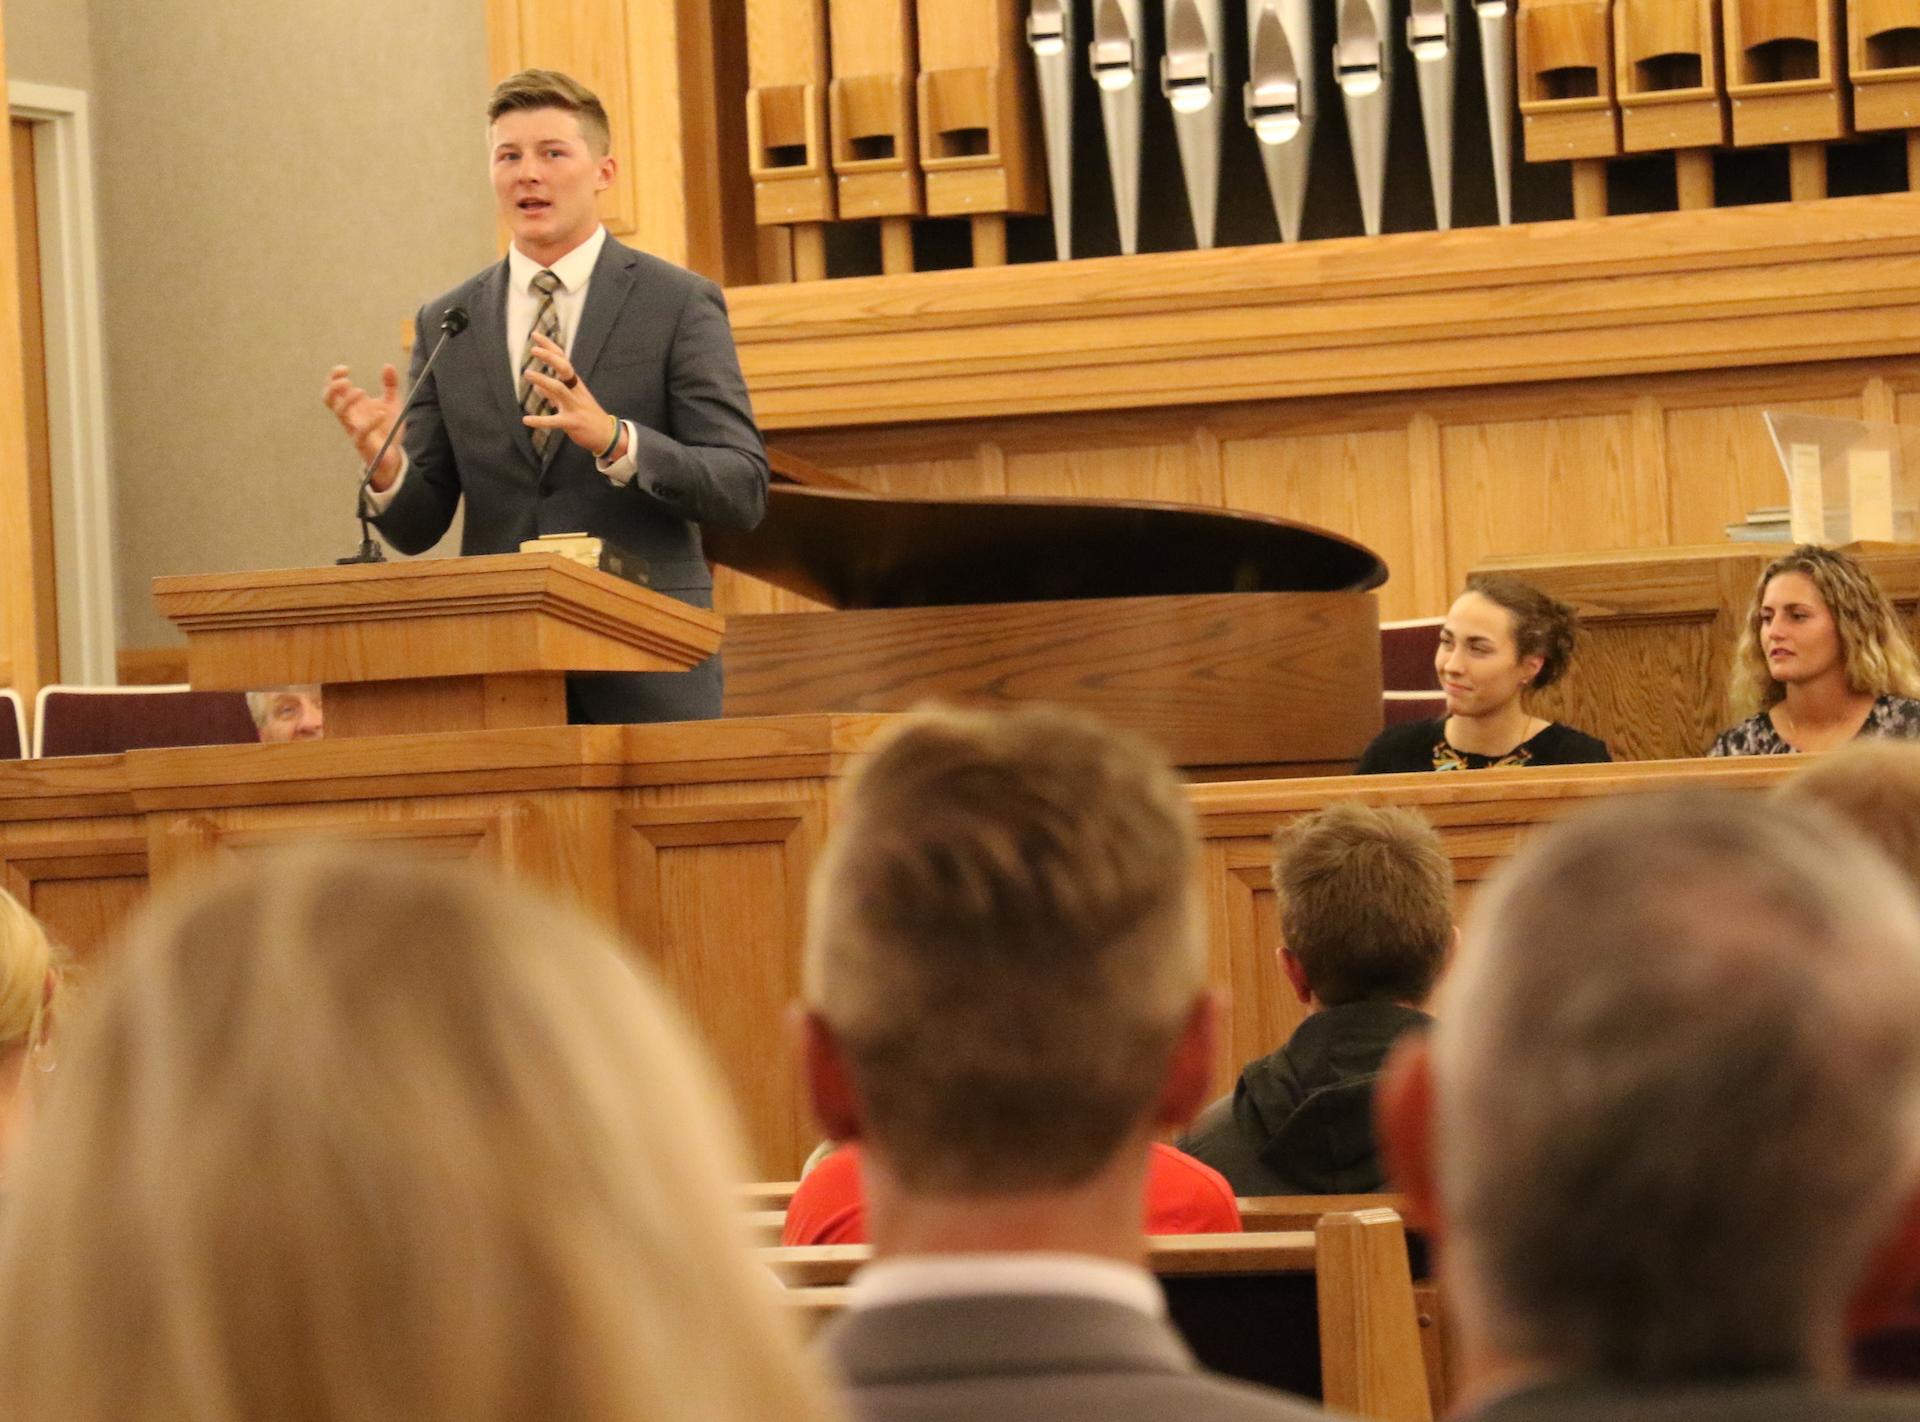 Utah quarterback Zach Hymas speaks at the Sept 27, 2019, athlete devotional at the Institute of Religion at the University of Utah.